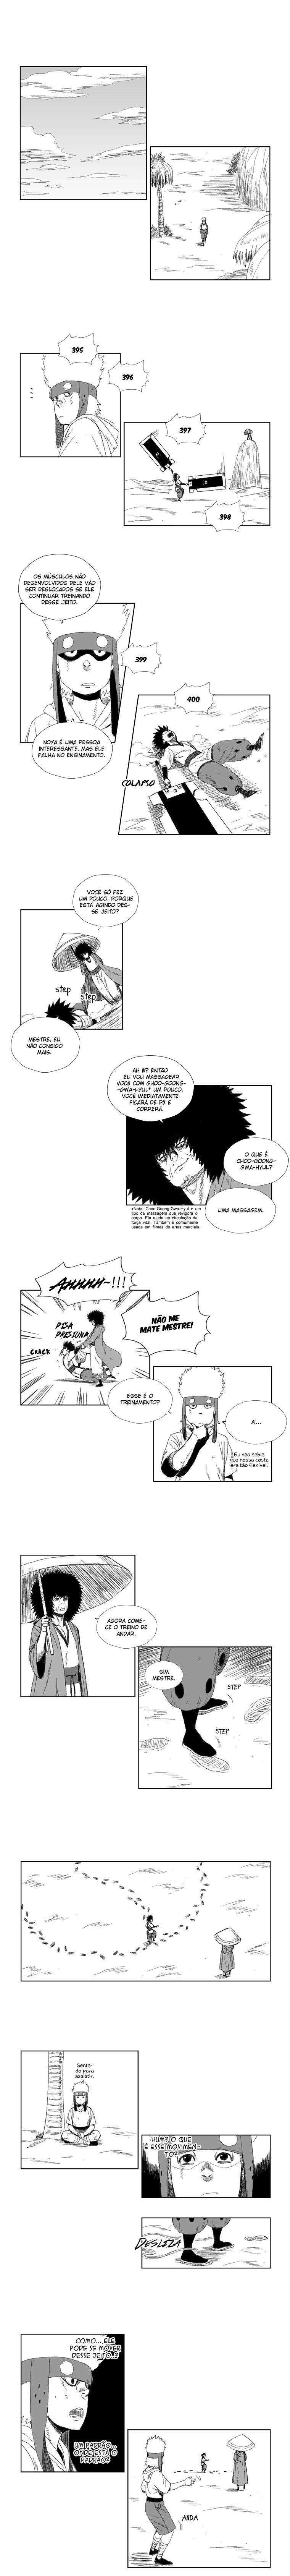 https://nine.mangadogs.com/br_manga/pic/29/1501/616314/RedStorm023690.jpg Page 5